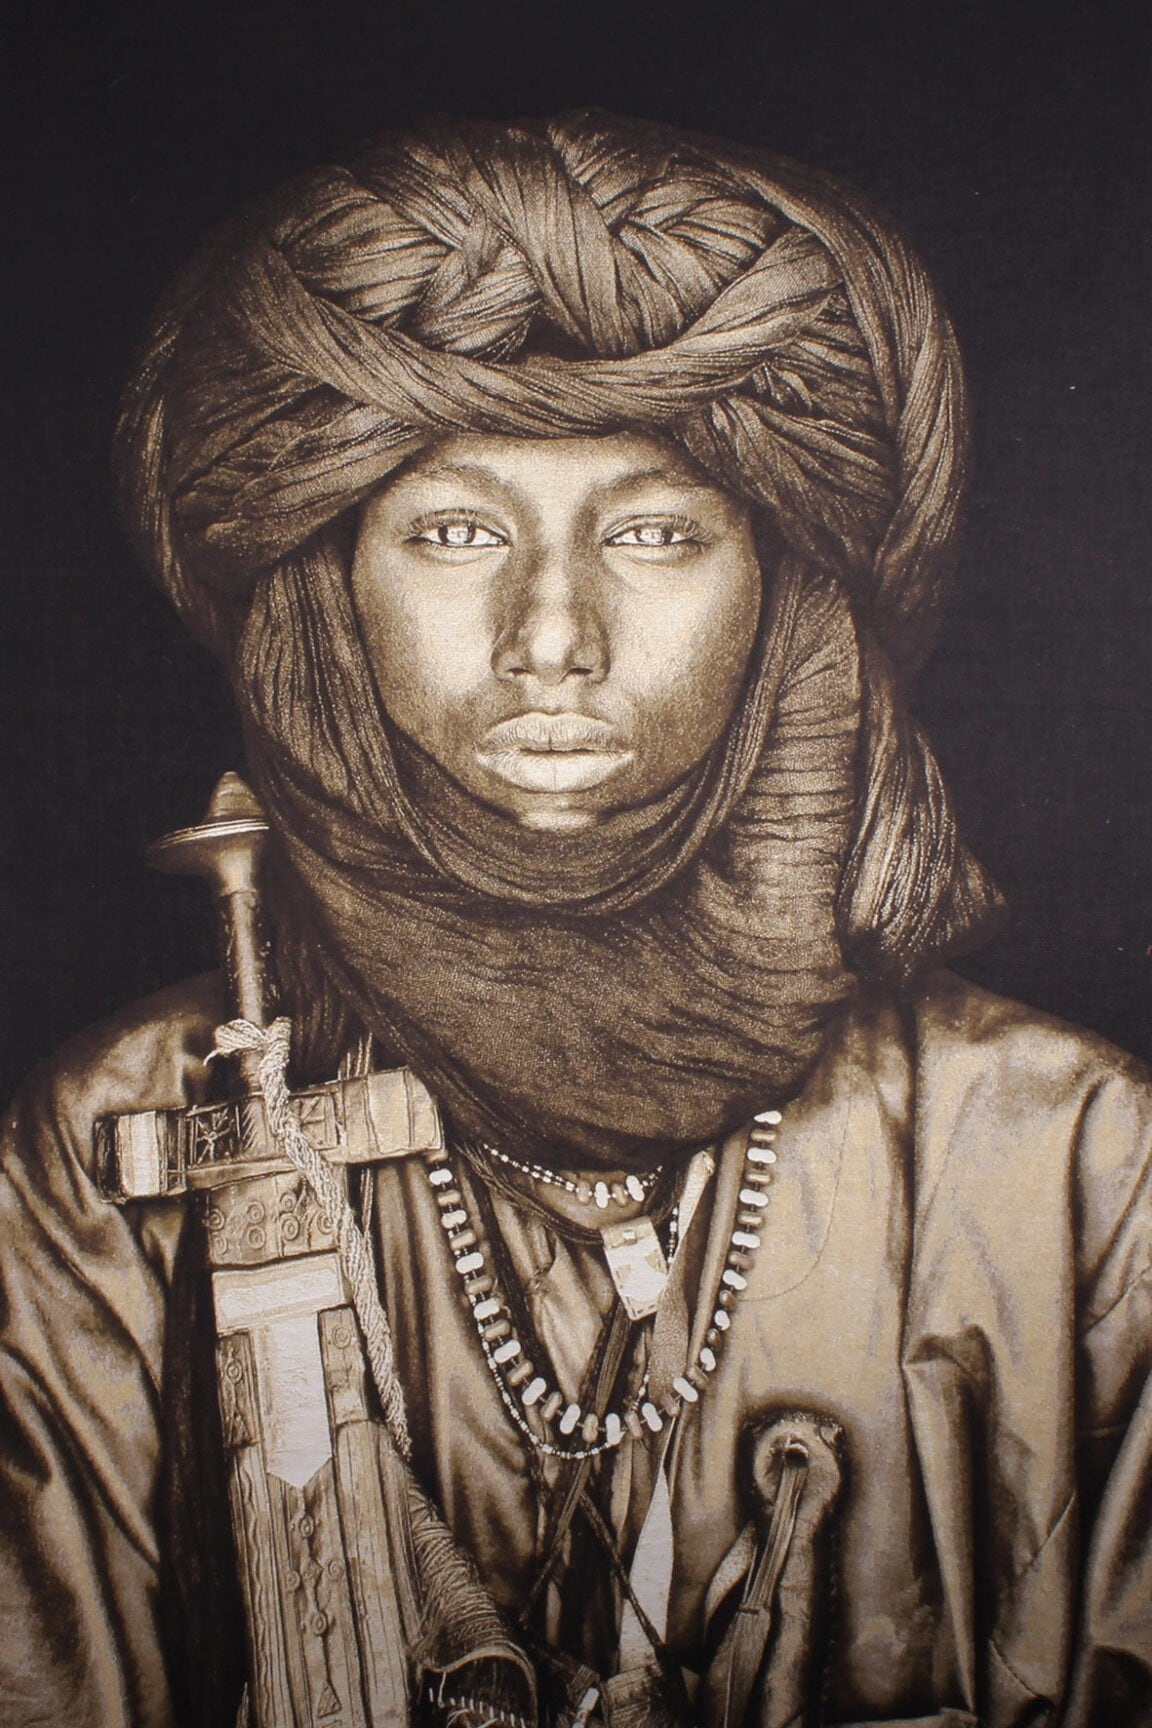 Gobelinbild-Dawo-Fulani-Tribe-Sepia